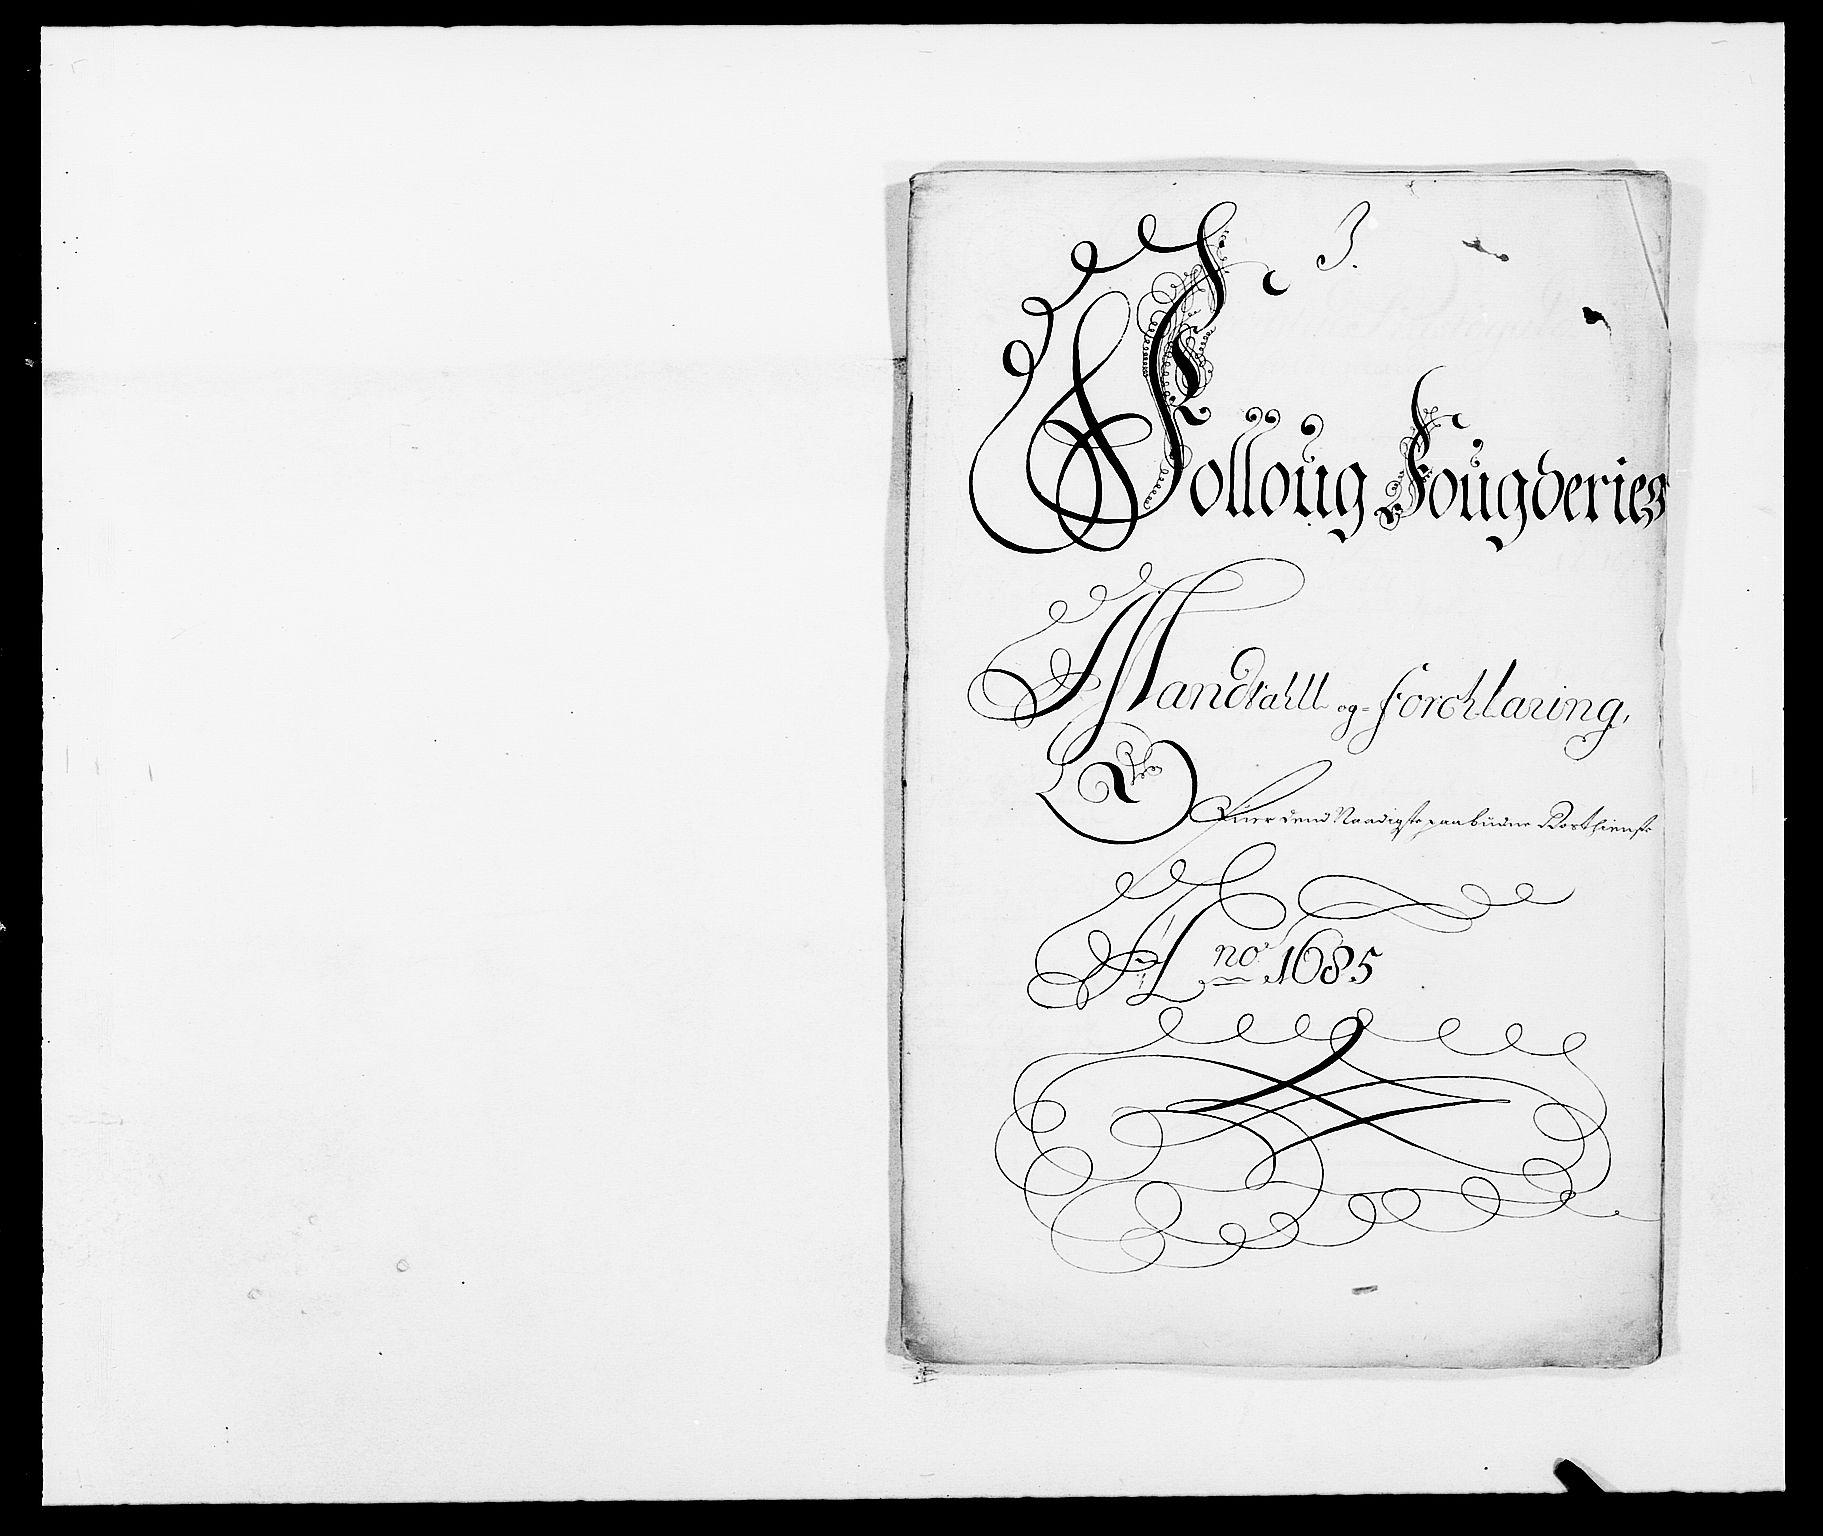 RA, Rentekammeret inntil 1814, Reviderte regnskaper, Fogderegnskap, R09/L0433: Fogderegnskap Follo, 1685-1686, s. 202